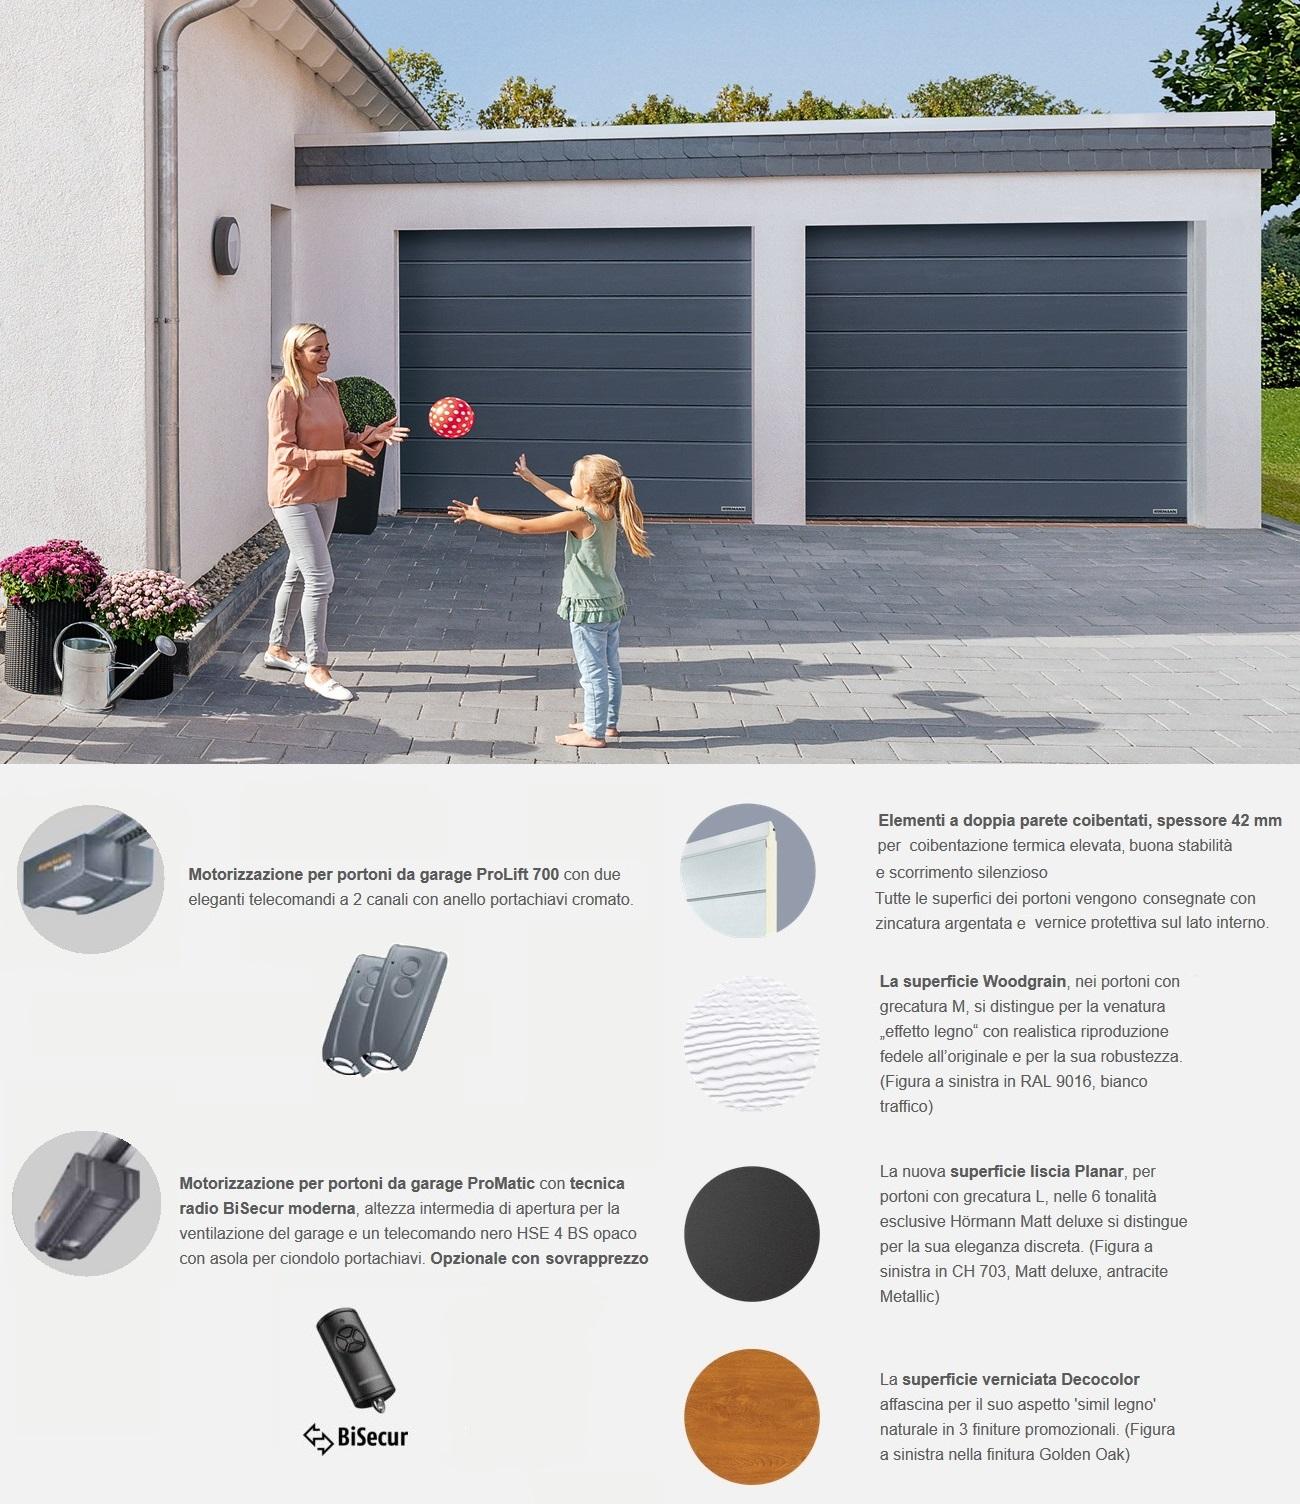 Hormann 2019 Garage Light: Offerta Portone Sezionale Da Garage Hormann RenoMatic 2019